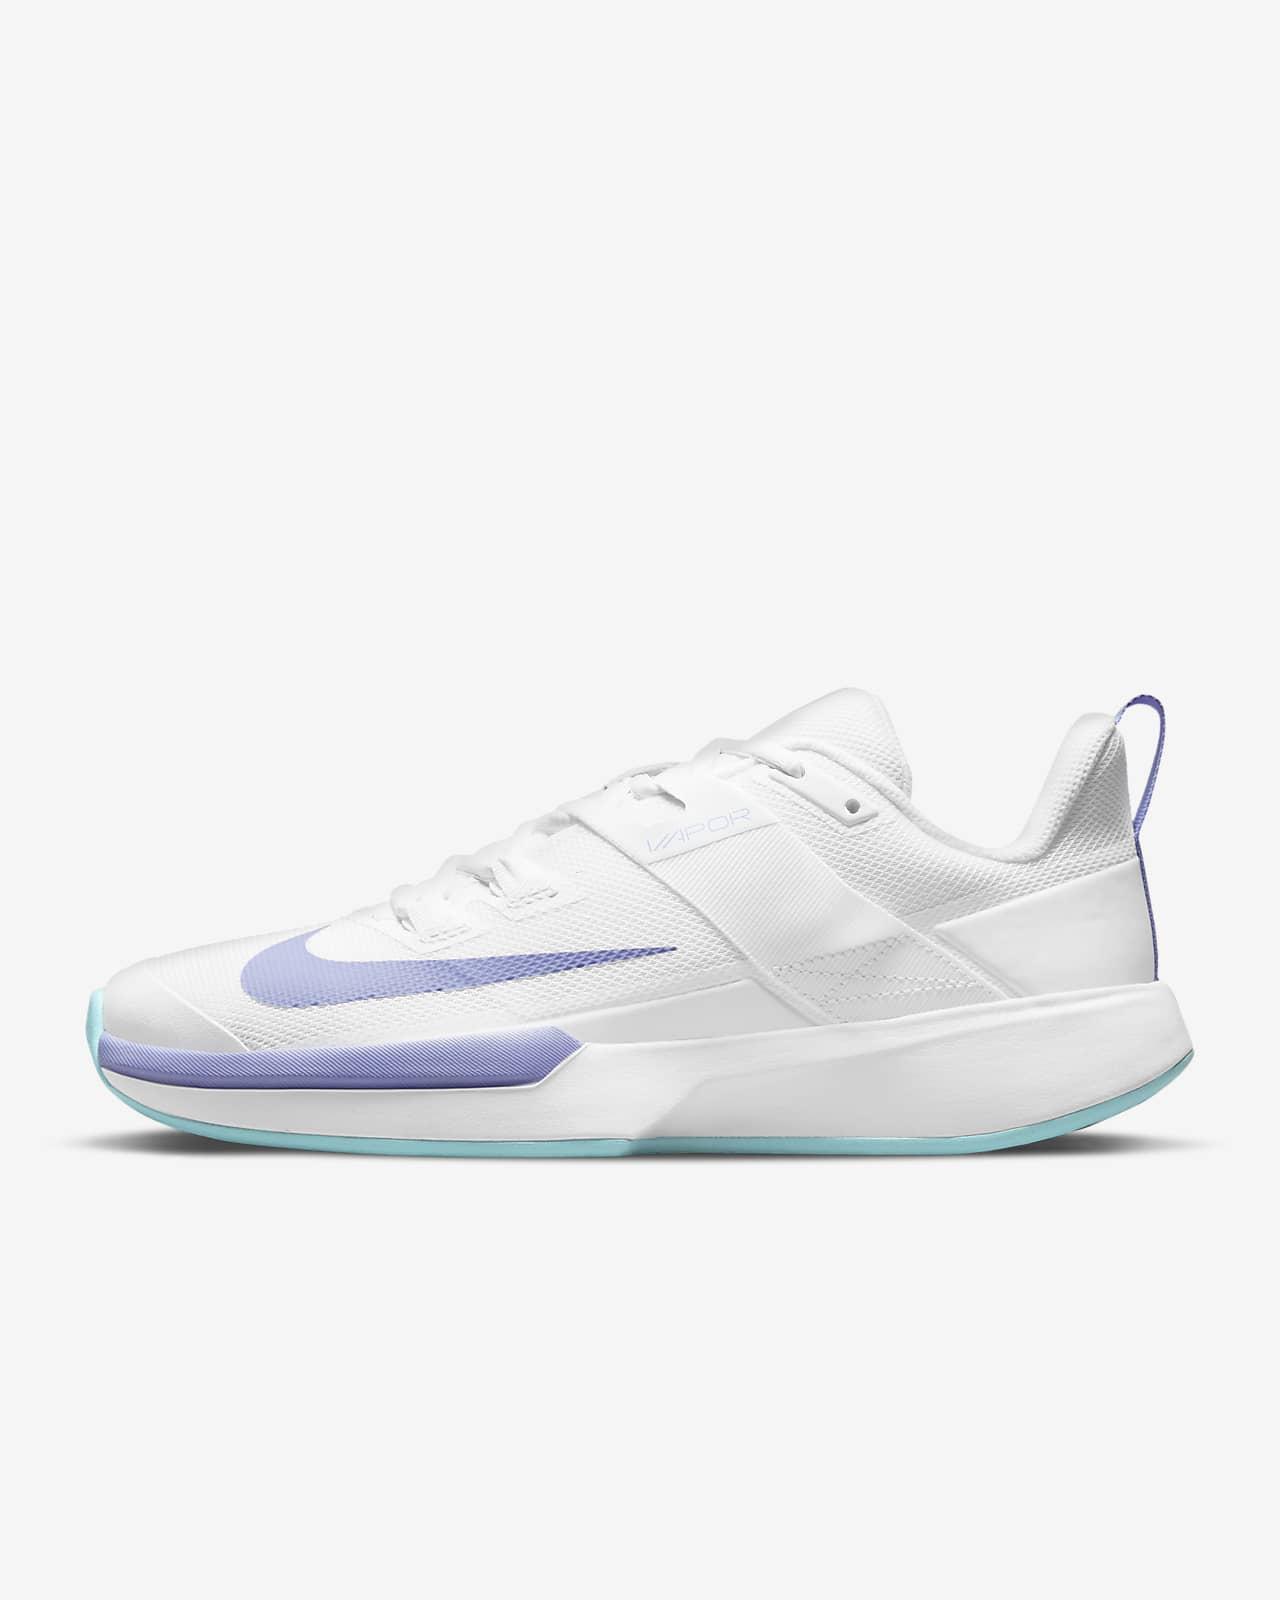 NikeCourt Vapor Lite Women's Hard Court Tennis Shoe